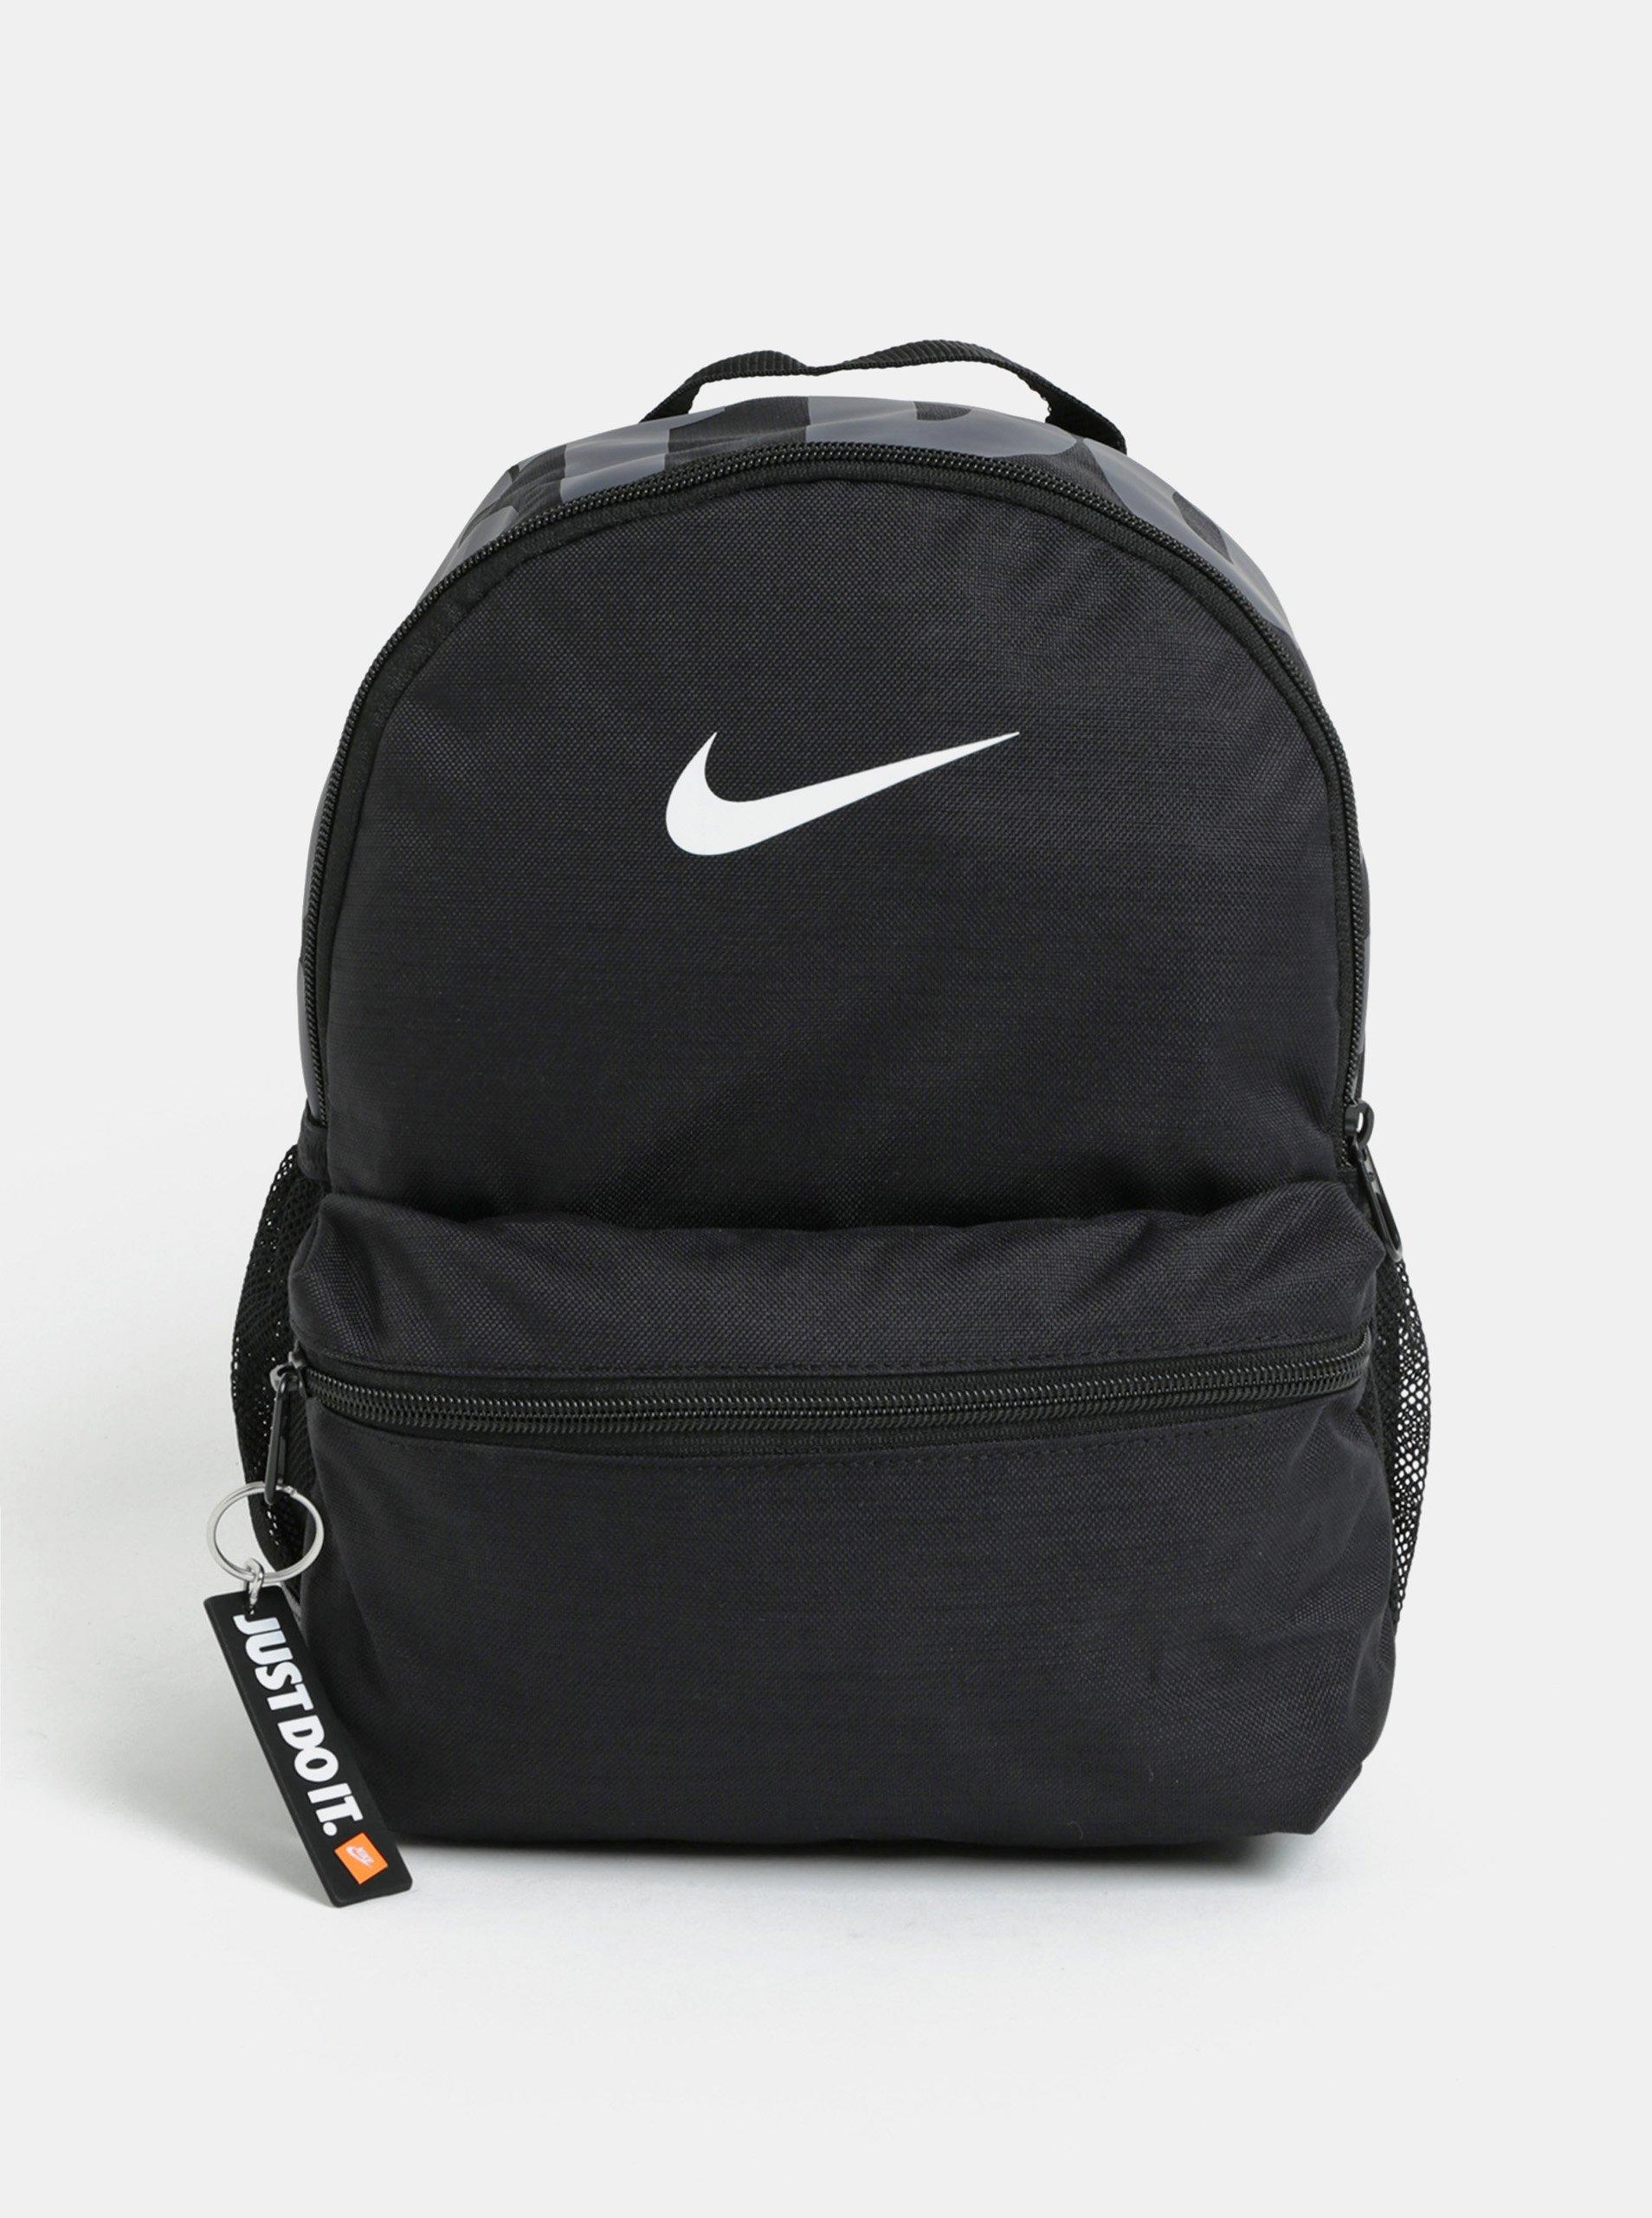 Černý batoh Nike Brasilia 11 l